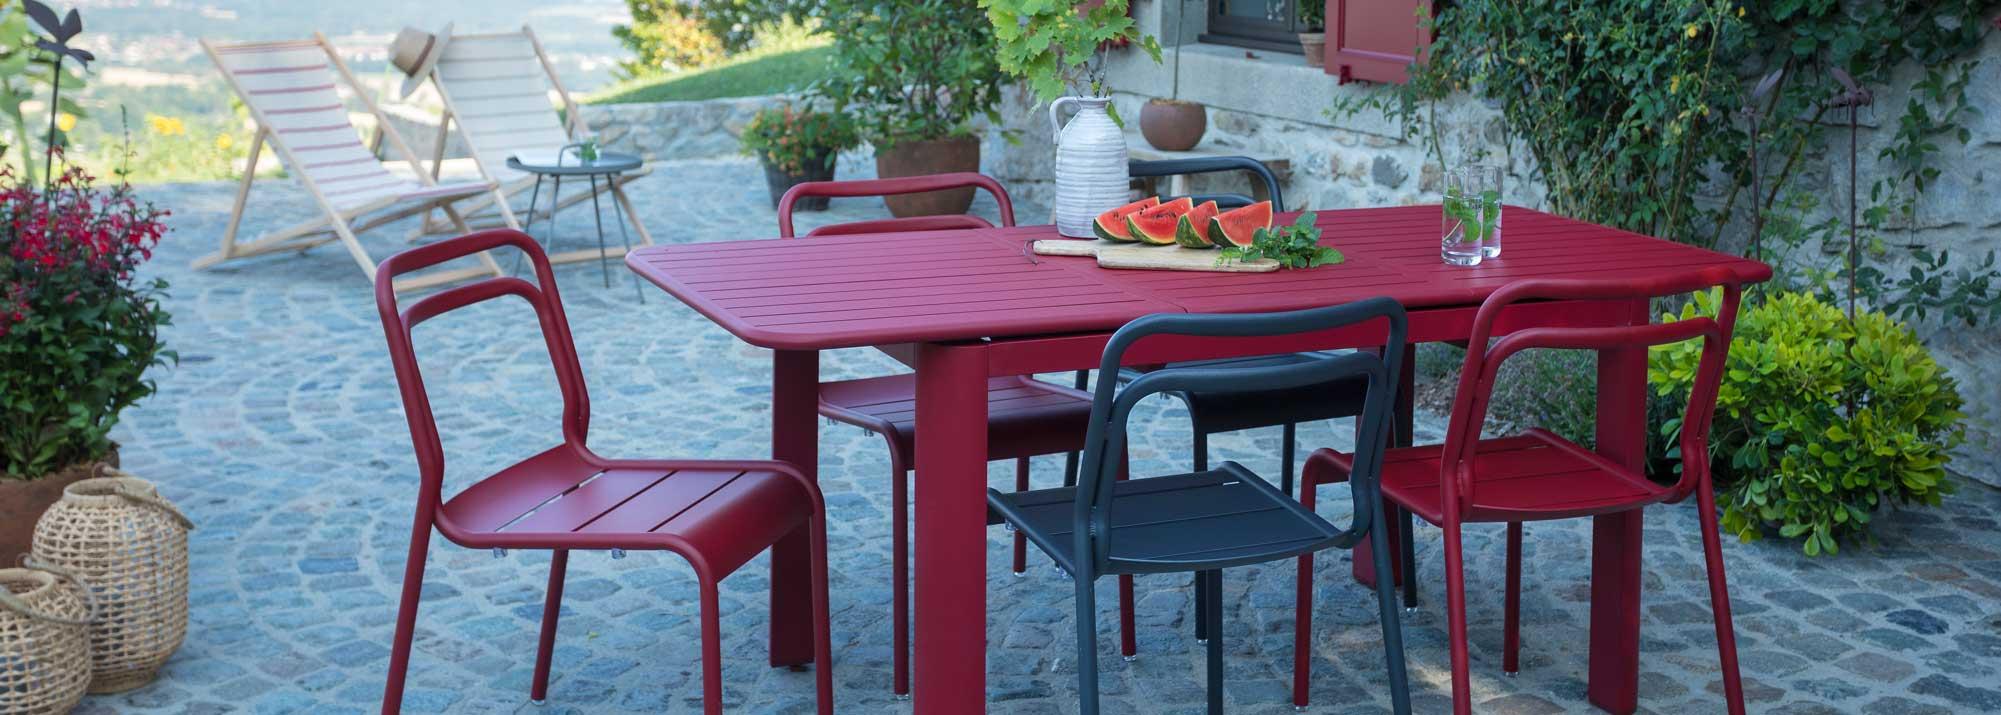 Table De Jardin : Botanic®, Tables De Jardin En Aluminium tout Table Jardin 4 Personnes